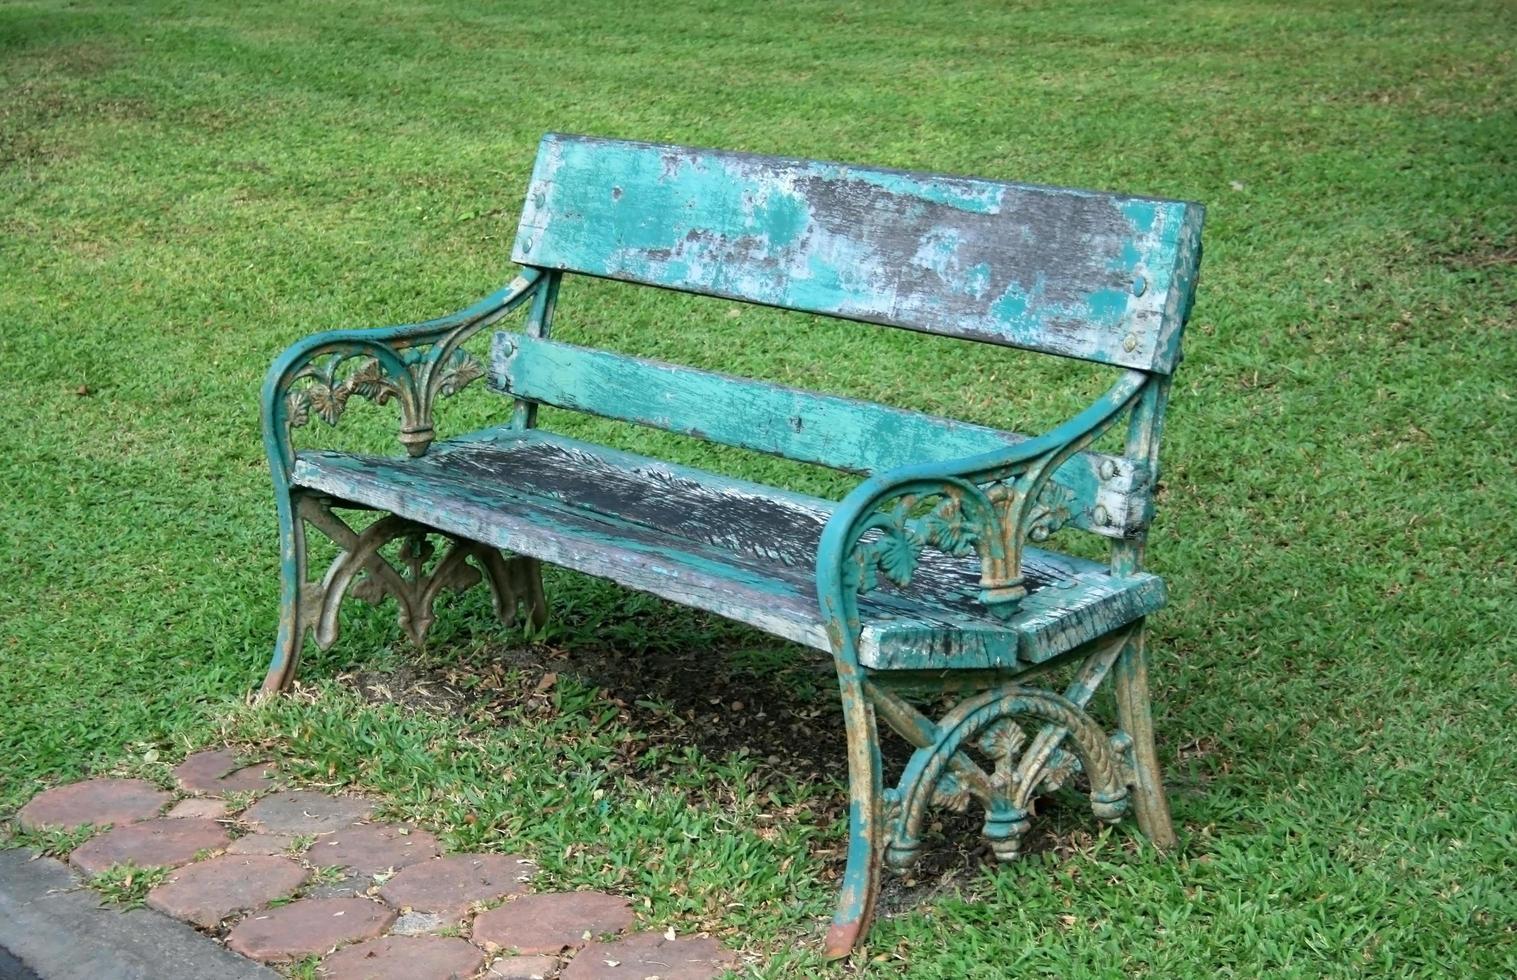 panchina blu nel parco foto